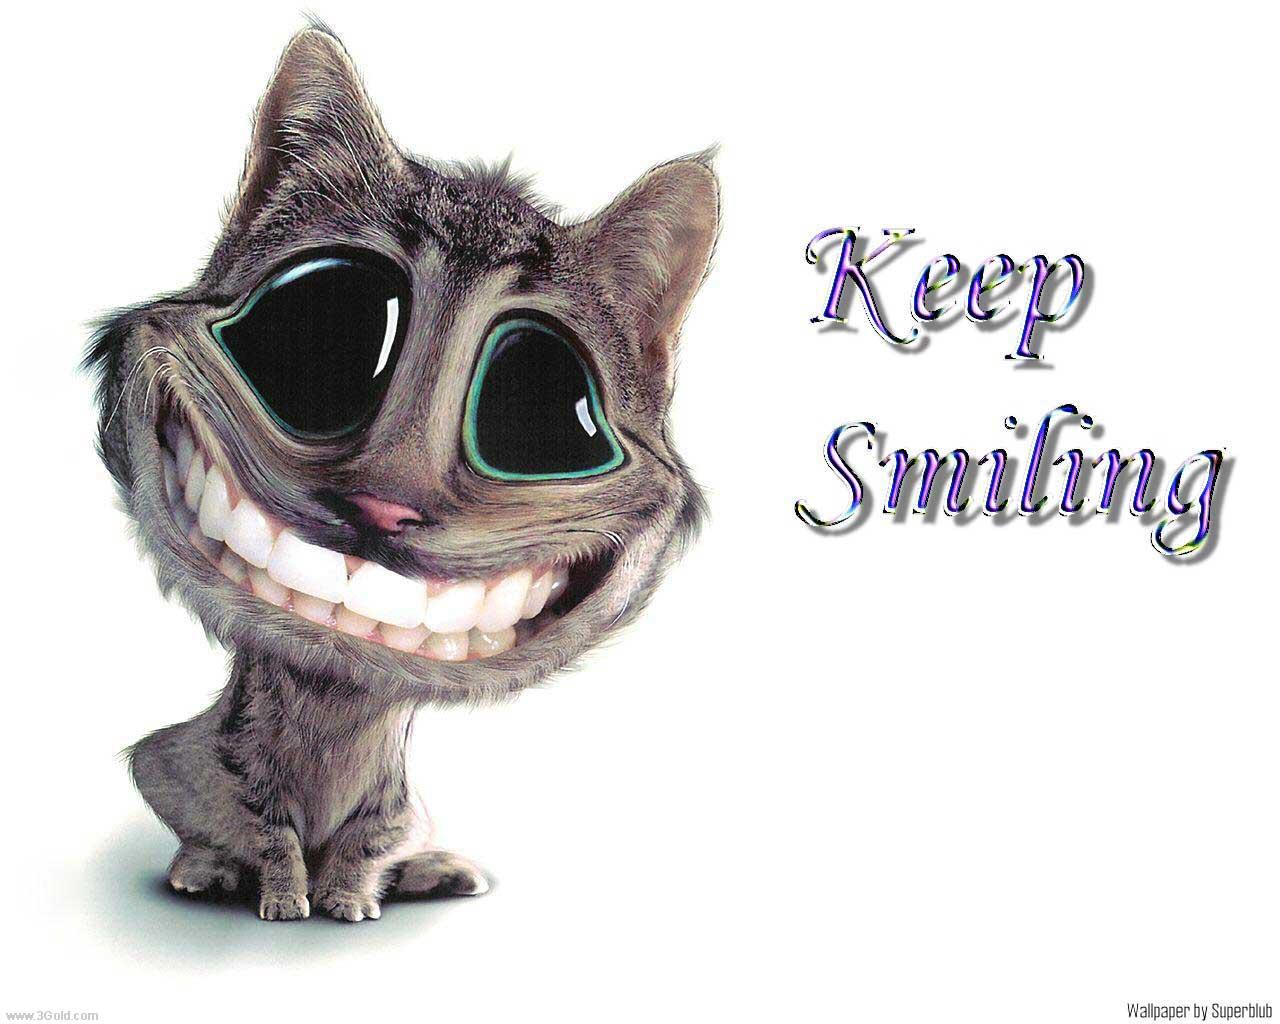 http://3.bp.blogspot.com/_ViUfL0PeROI/TFff6-la6FI/AAAAAAAAAIY/gJHV2aKDZfA/s1600/smiling.jpg